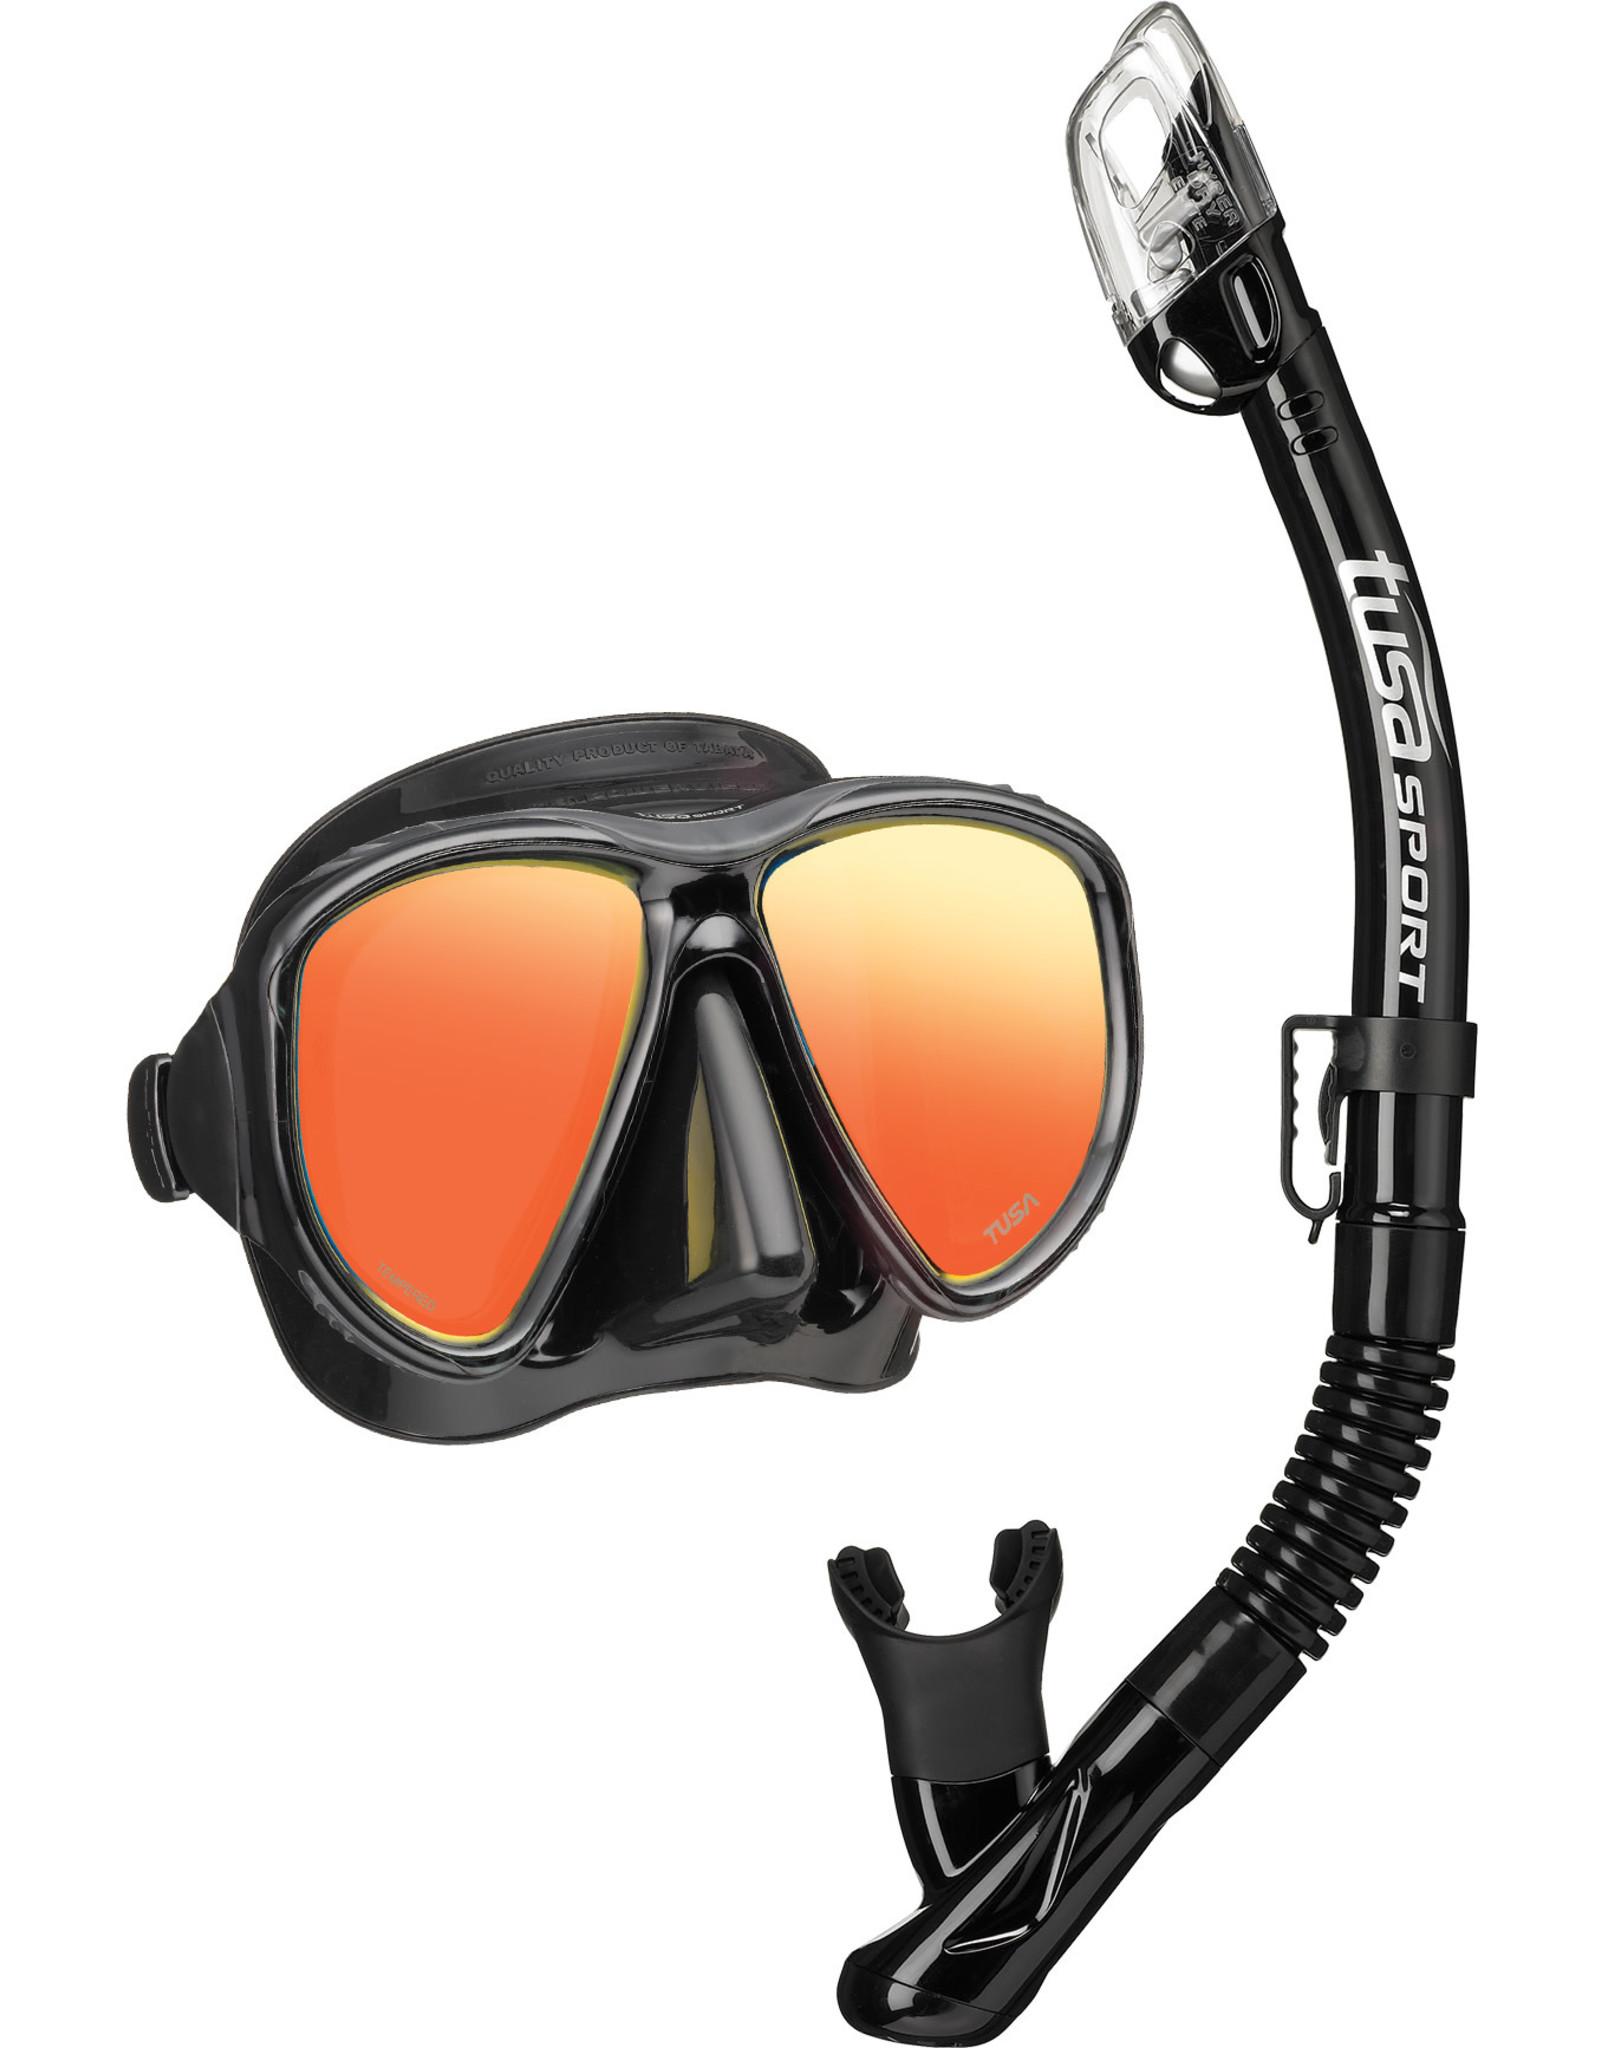 TUSA TUSA Powerview Adult Dry Combo (Mirror Lens) - Black/Black